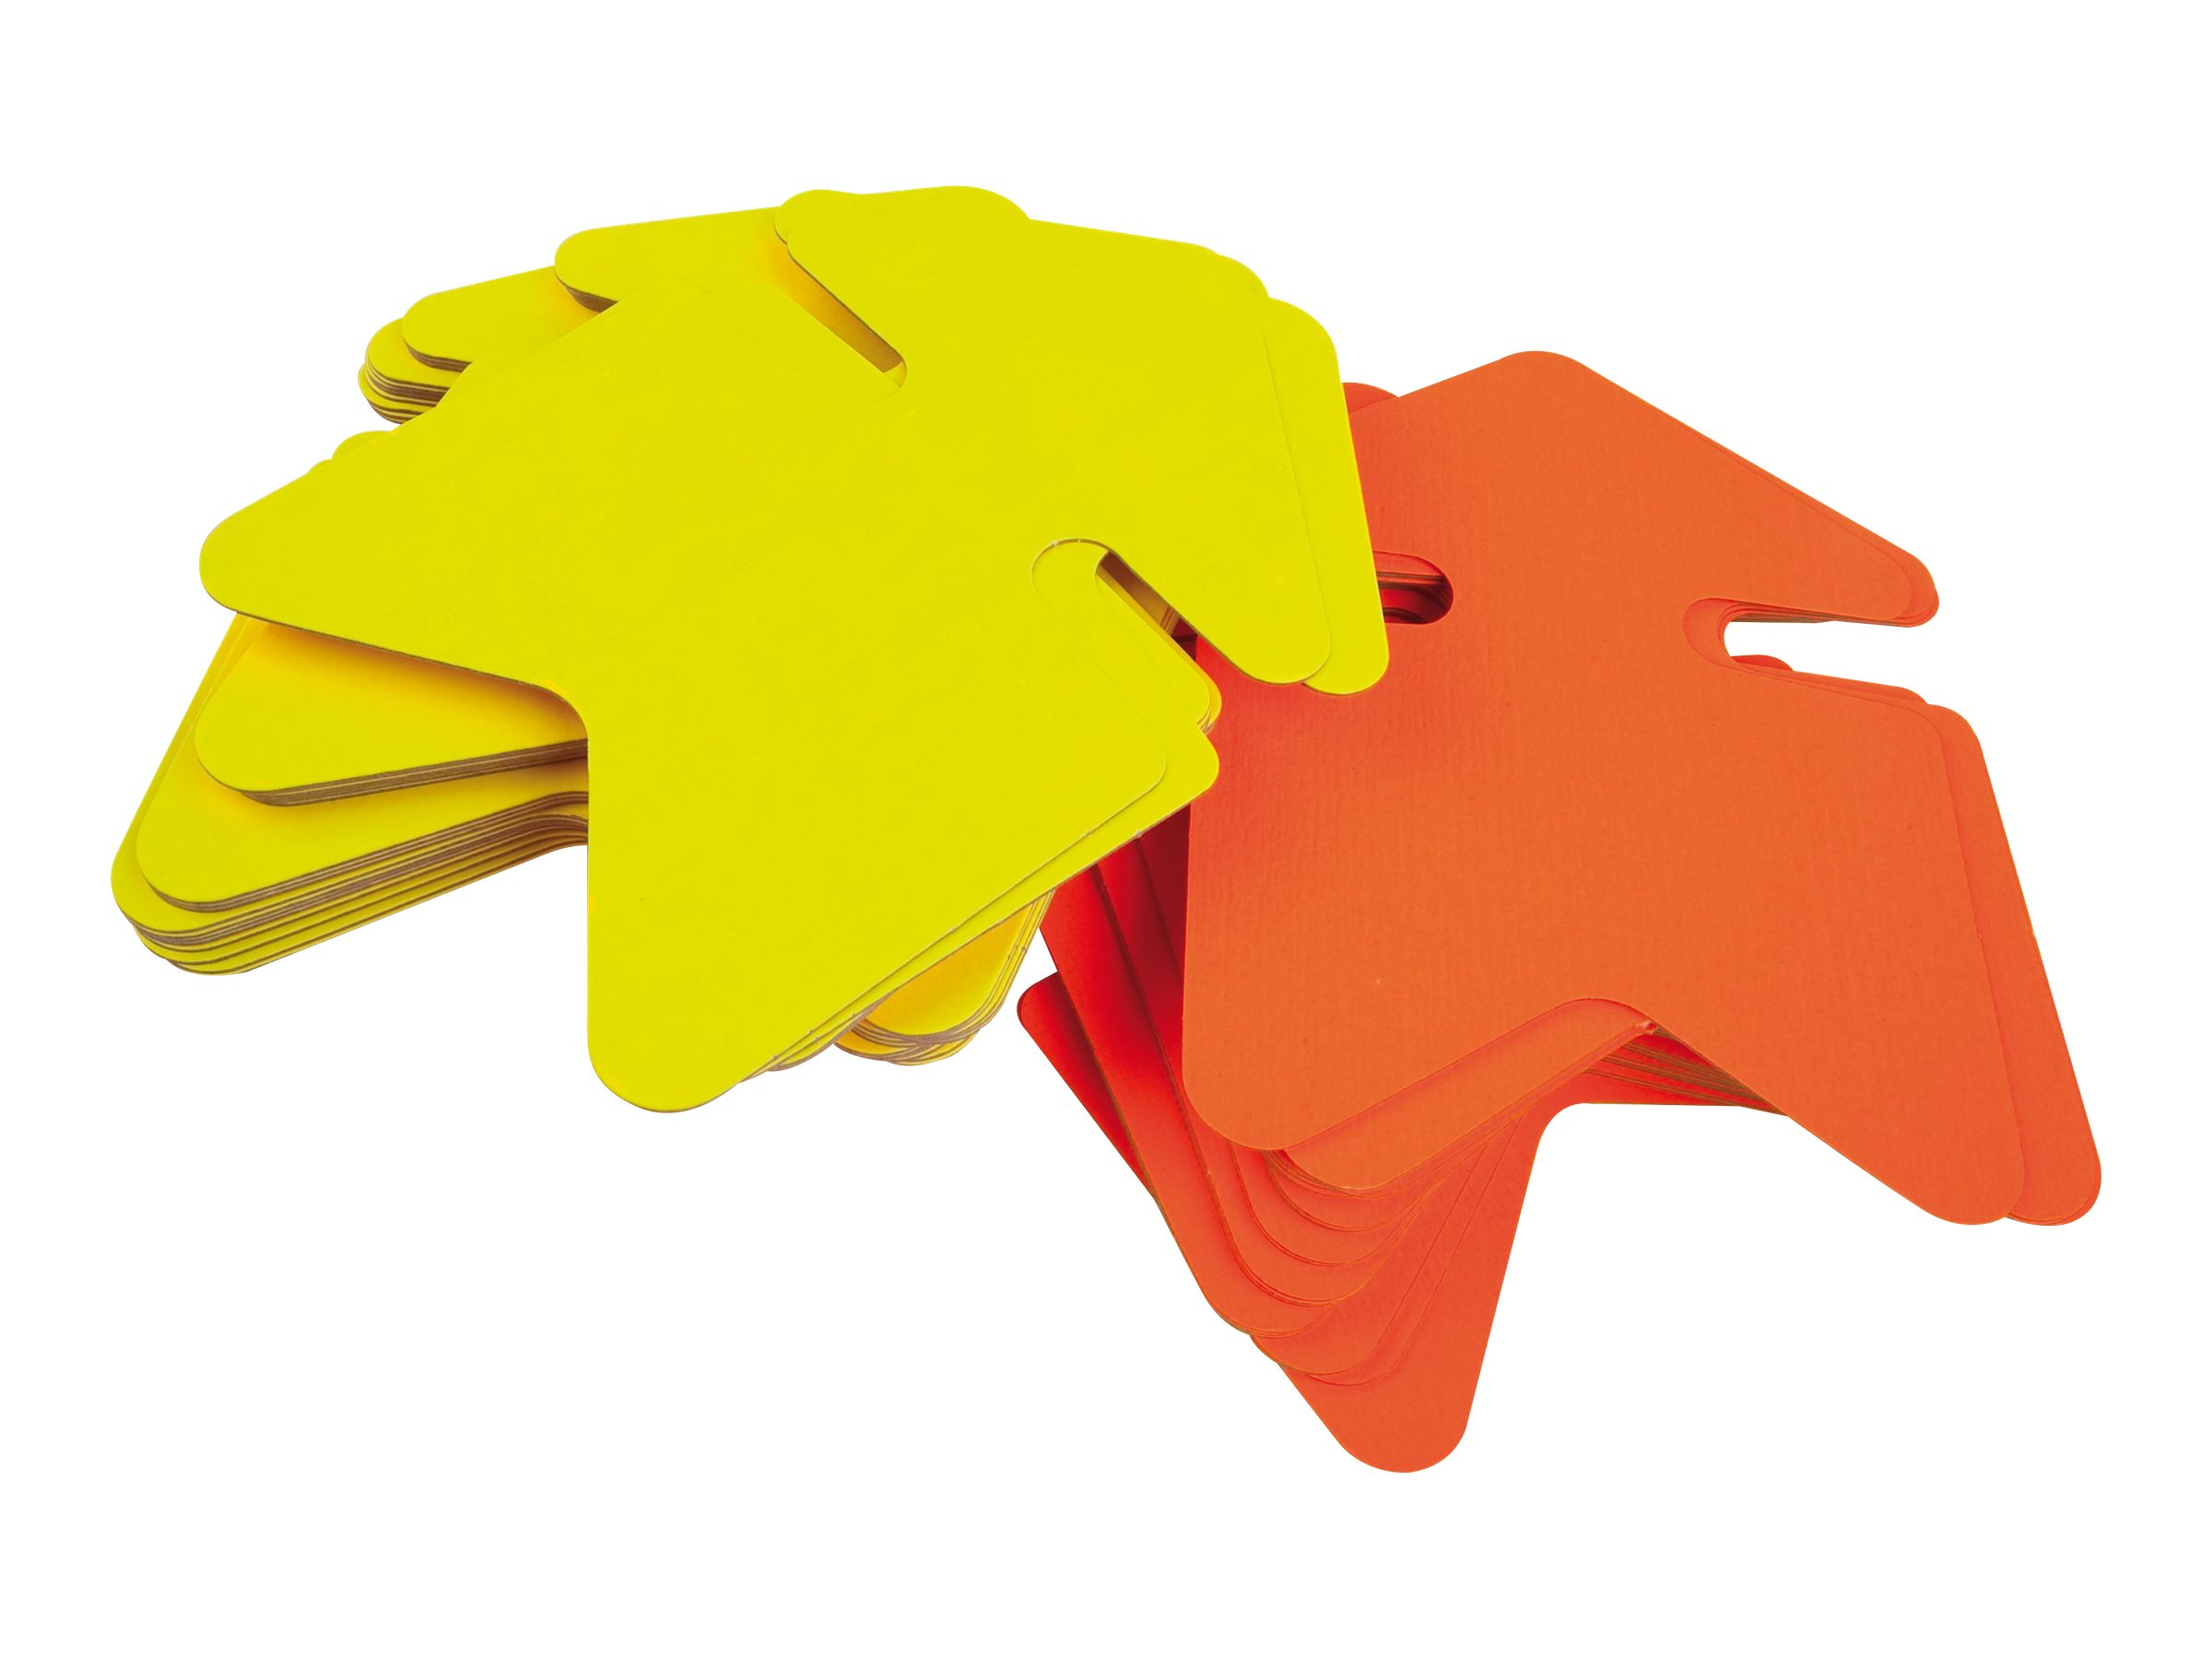 Apli Agipa - 10 flèches fluo non effaçables - jaune/orange - 32 x 48 cm